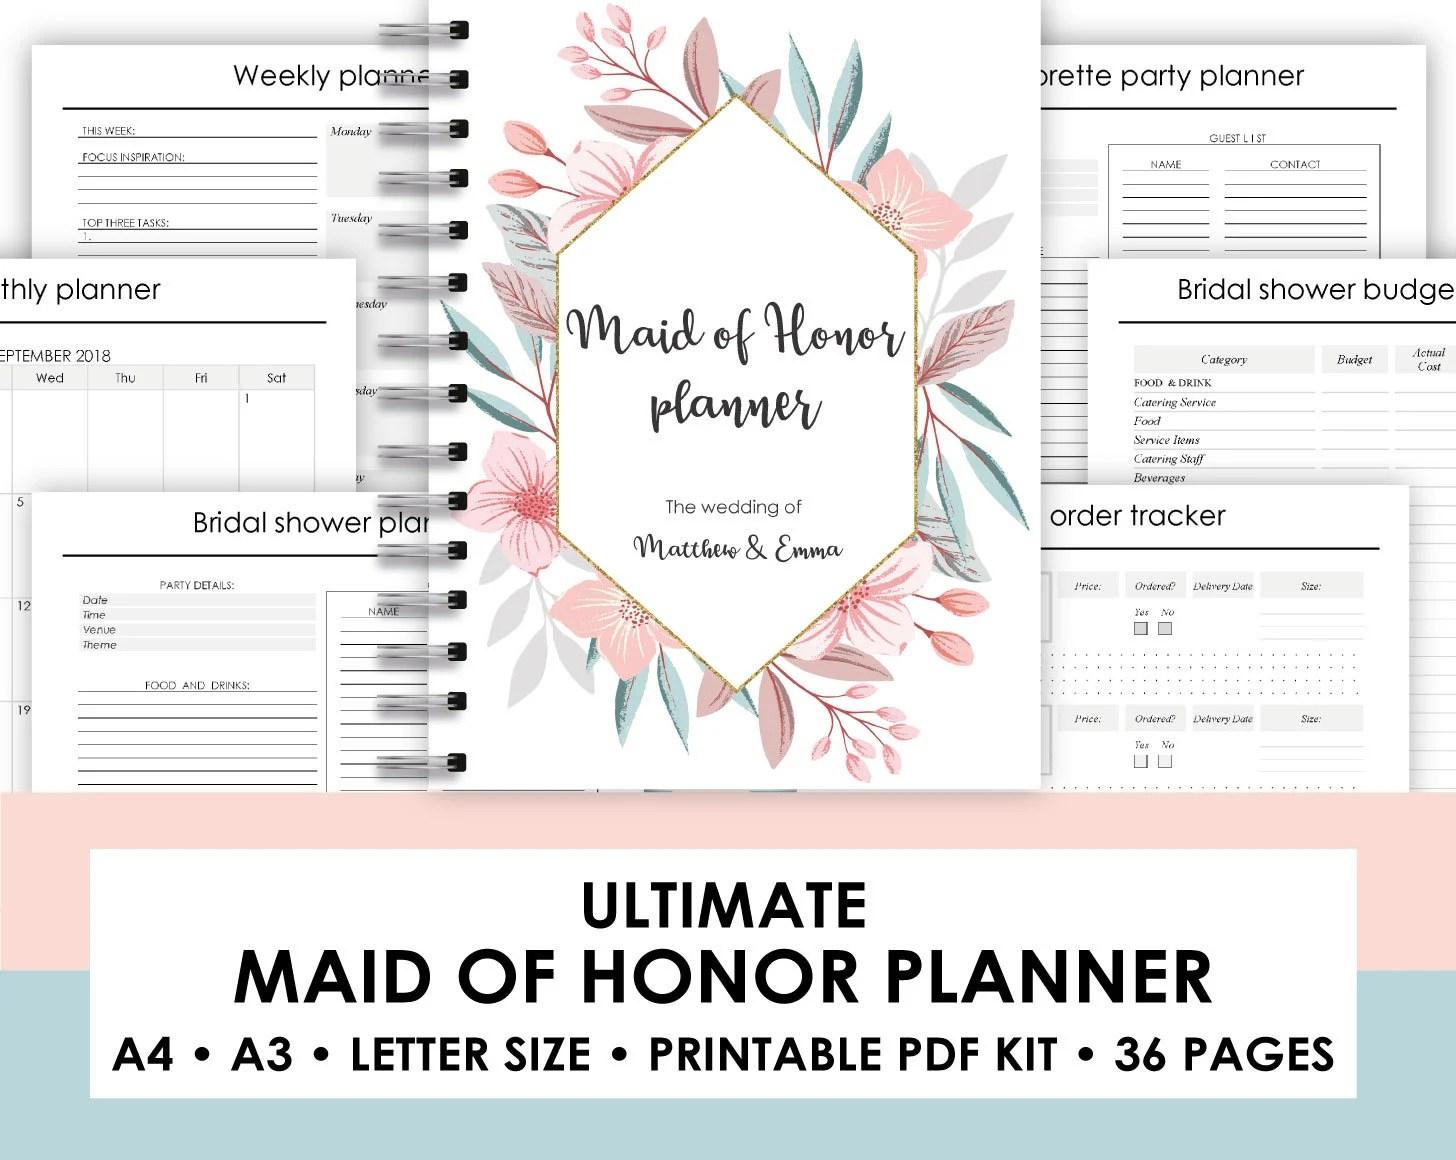 downloadable wedding planner - Pinarkubkireklamowe